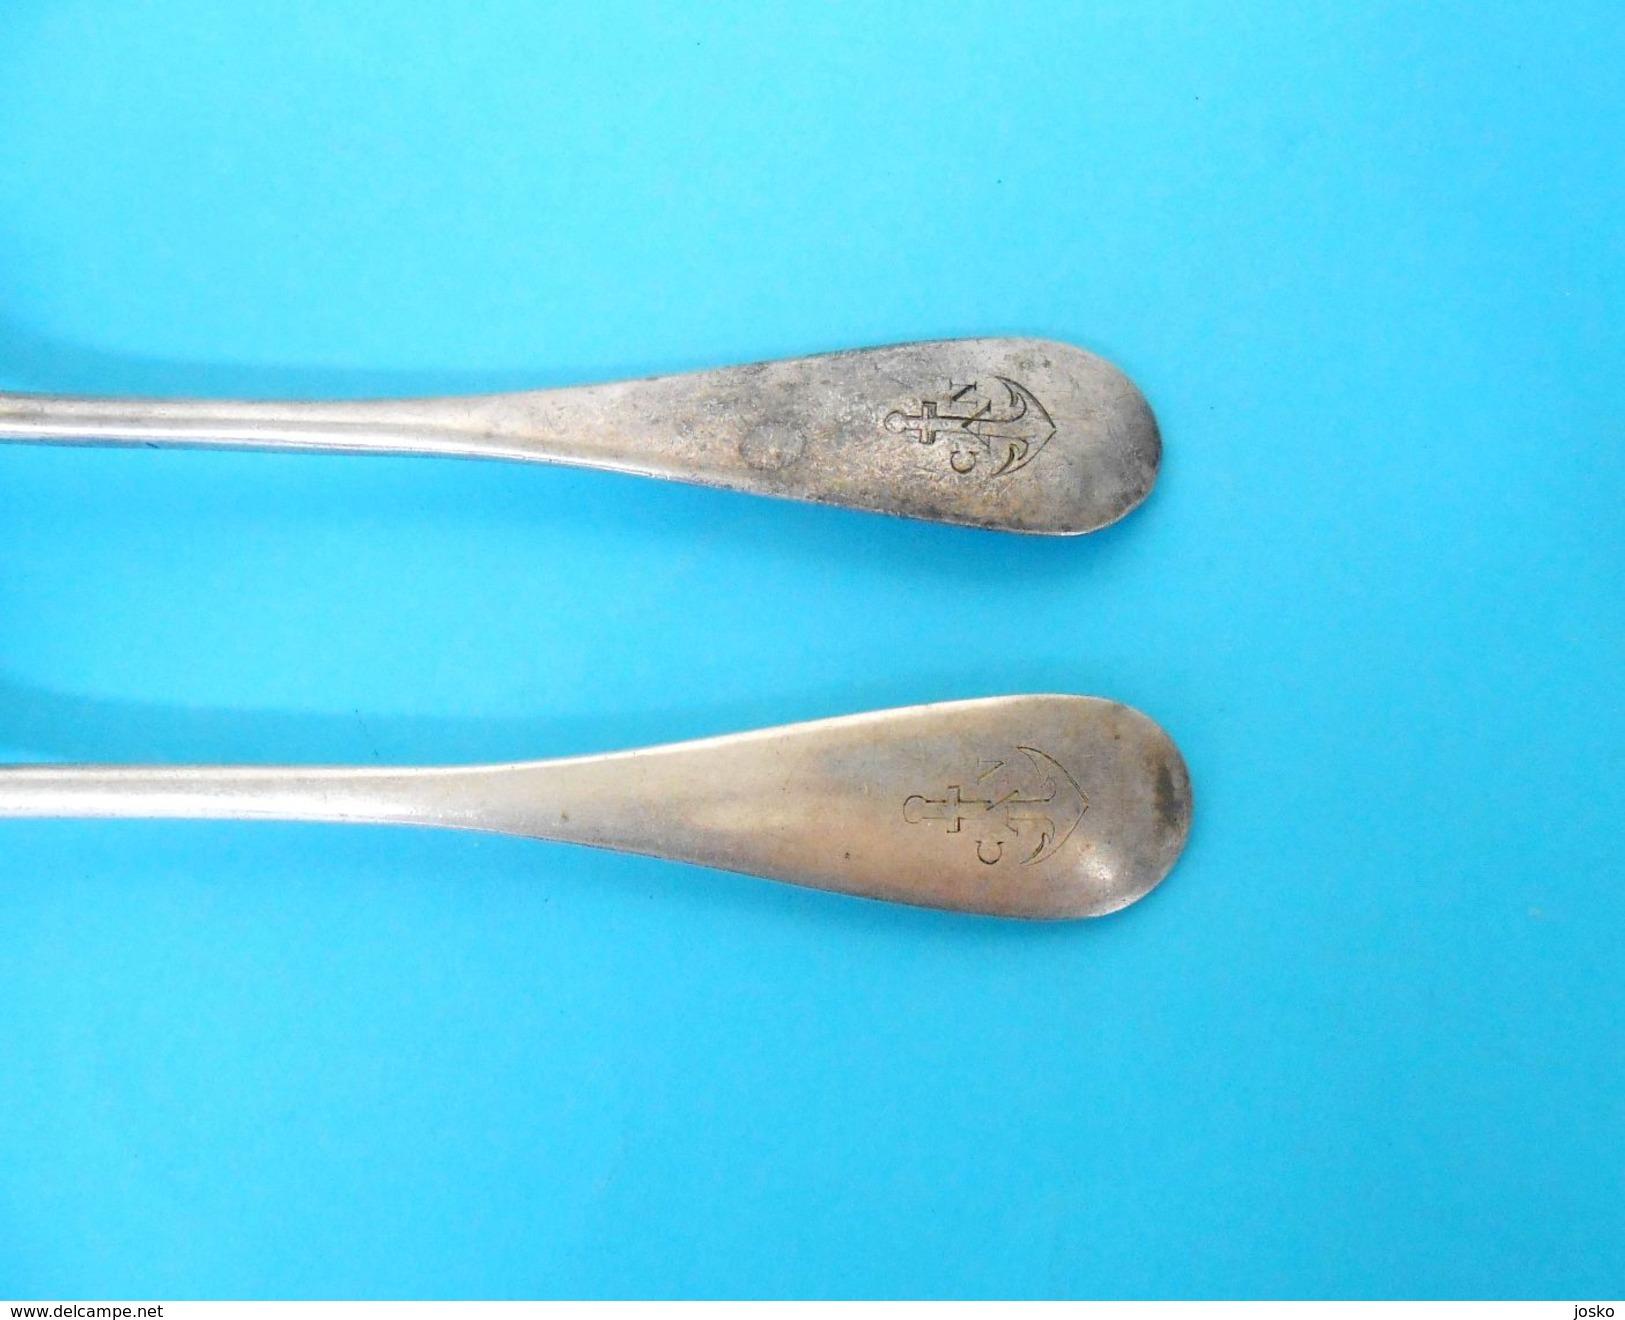 COMPAGNIE AFRICAINE DE NAVIGATION - Was A Belgium Shipping Company * Vintage Set Spoon + Fork * Cuiller Fourchet Belgie - Boats